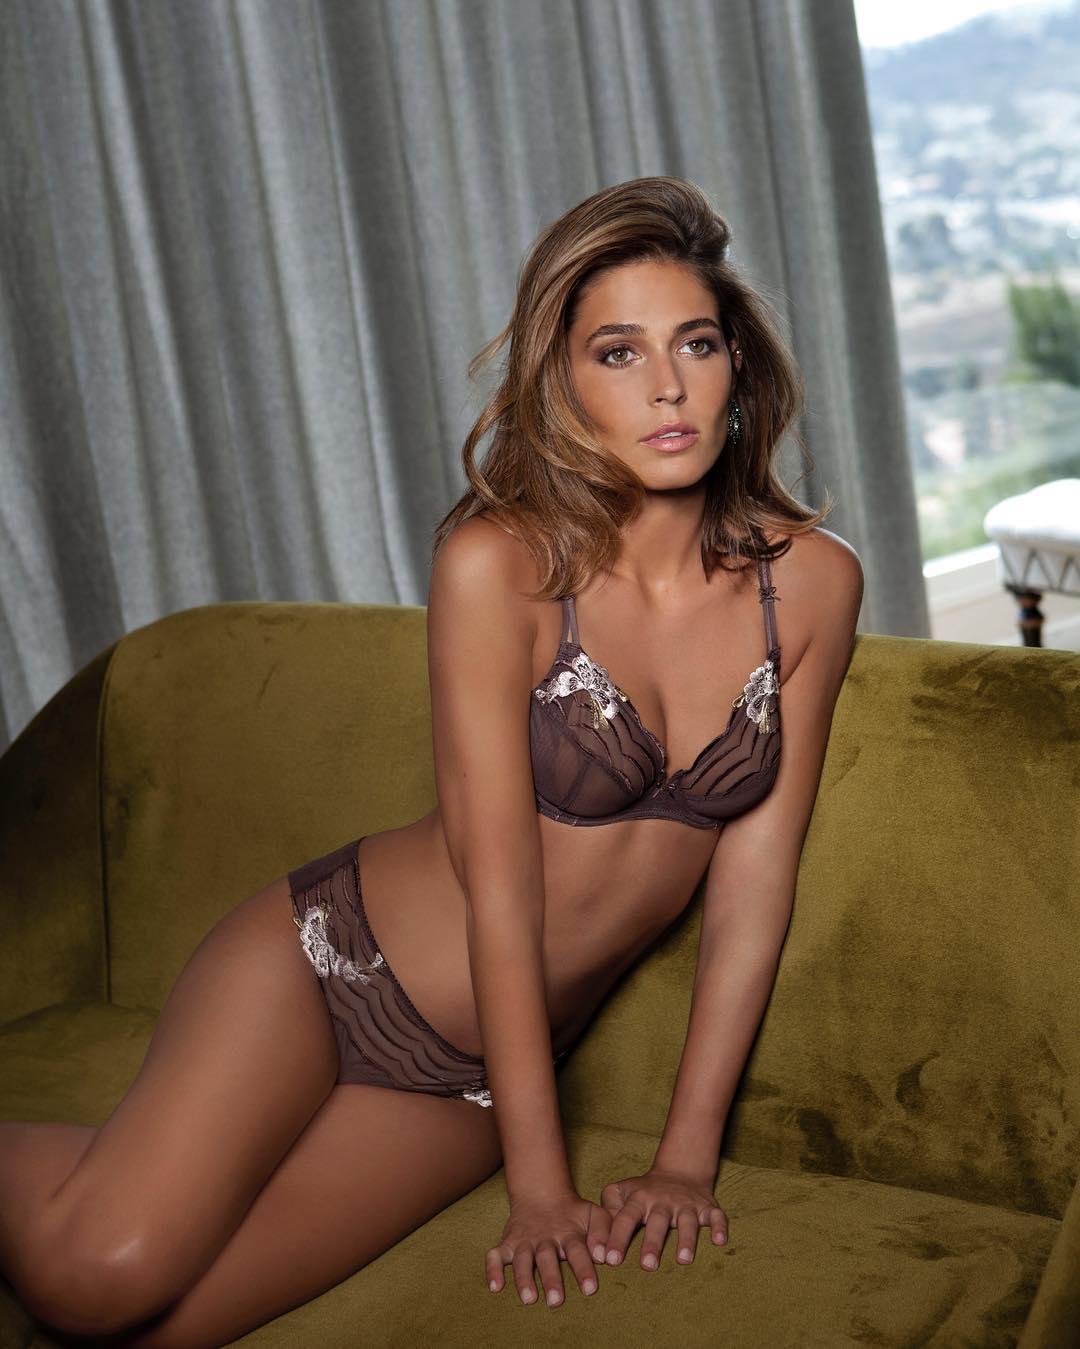 Sexy Coral Simanovich nude (49 photos), Pussy, Paparazzi, Instagram, panties 2020